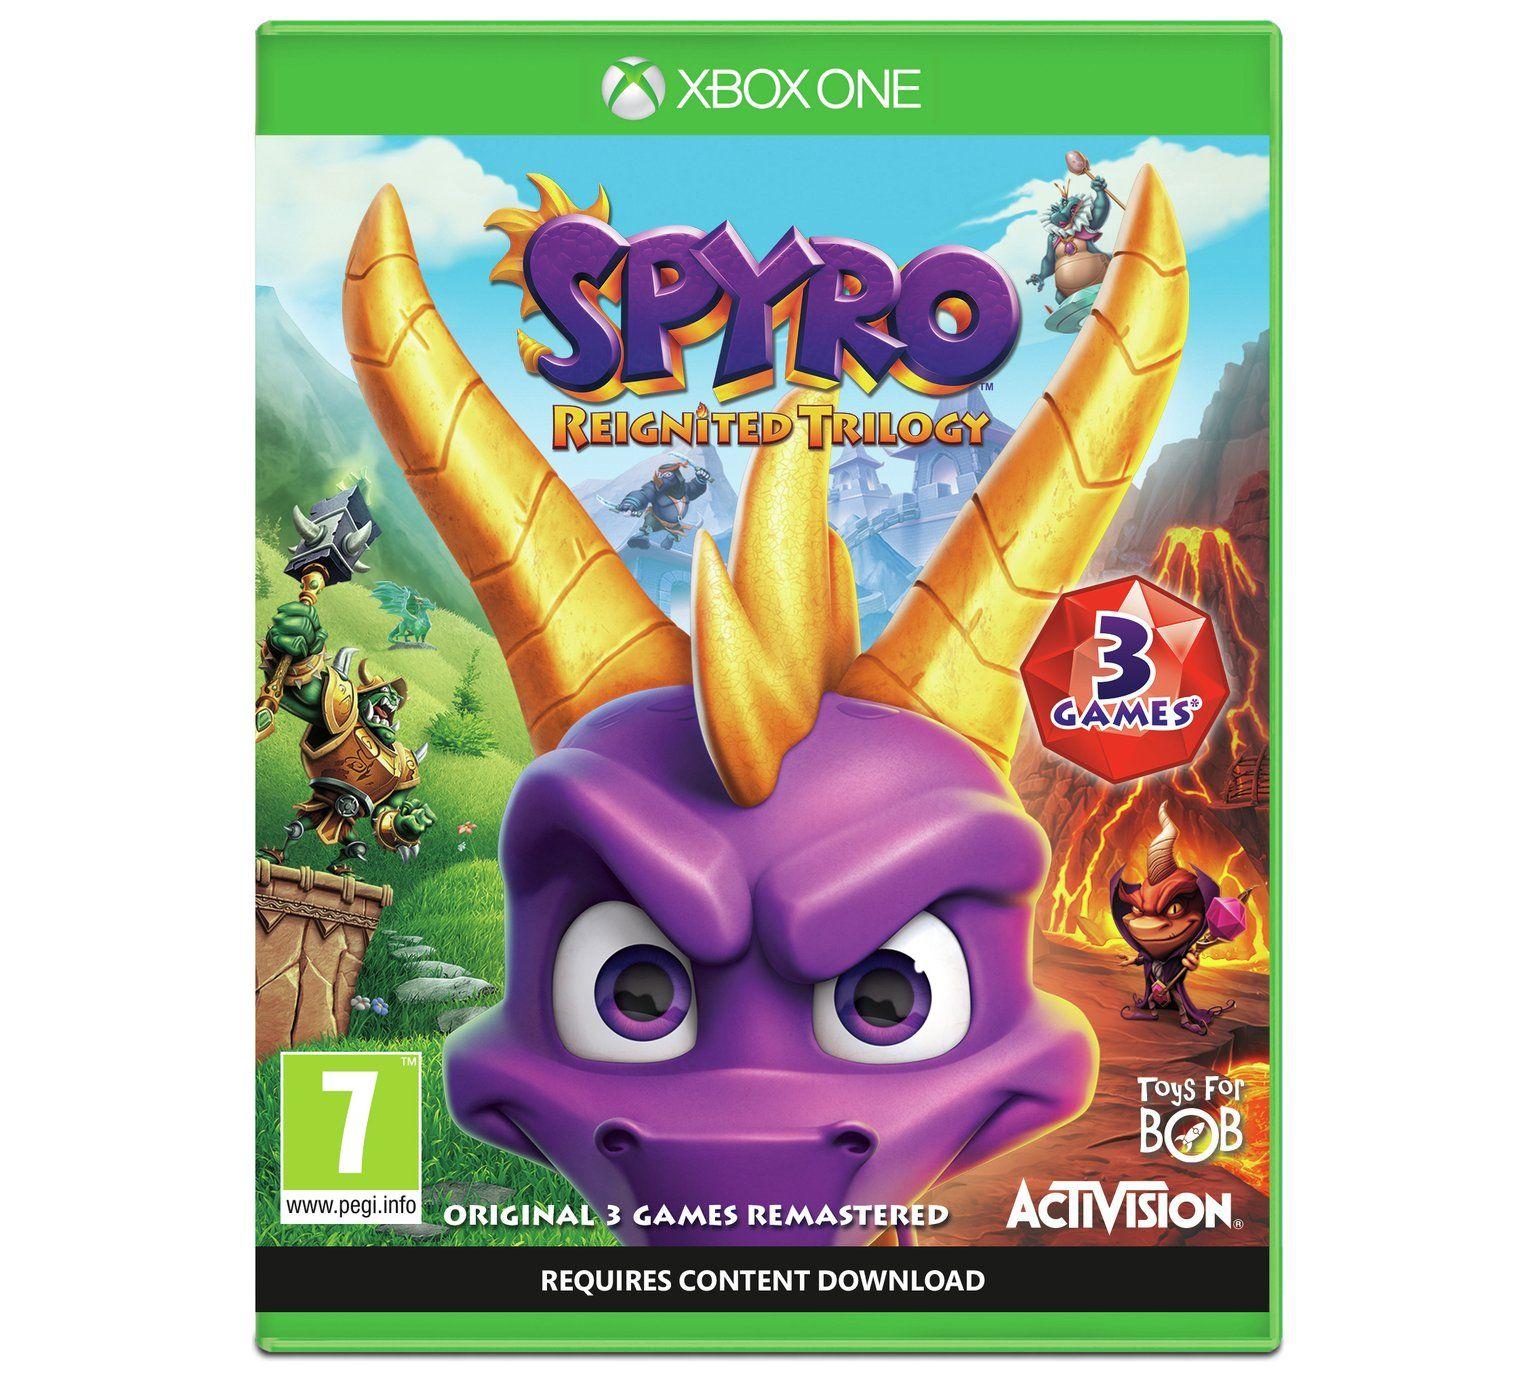 Spyro Reignited Trilogy Xbox One/PS4 £22.99 @ Argos